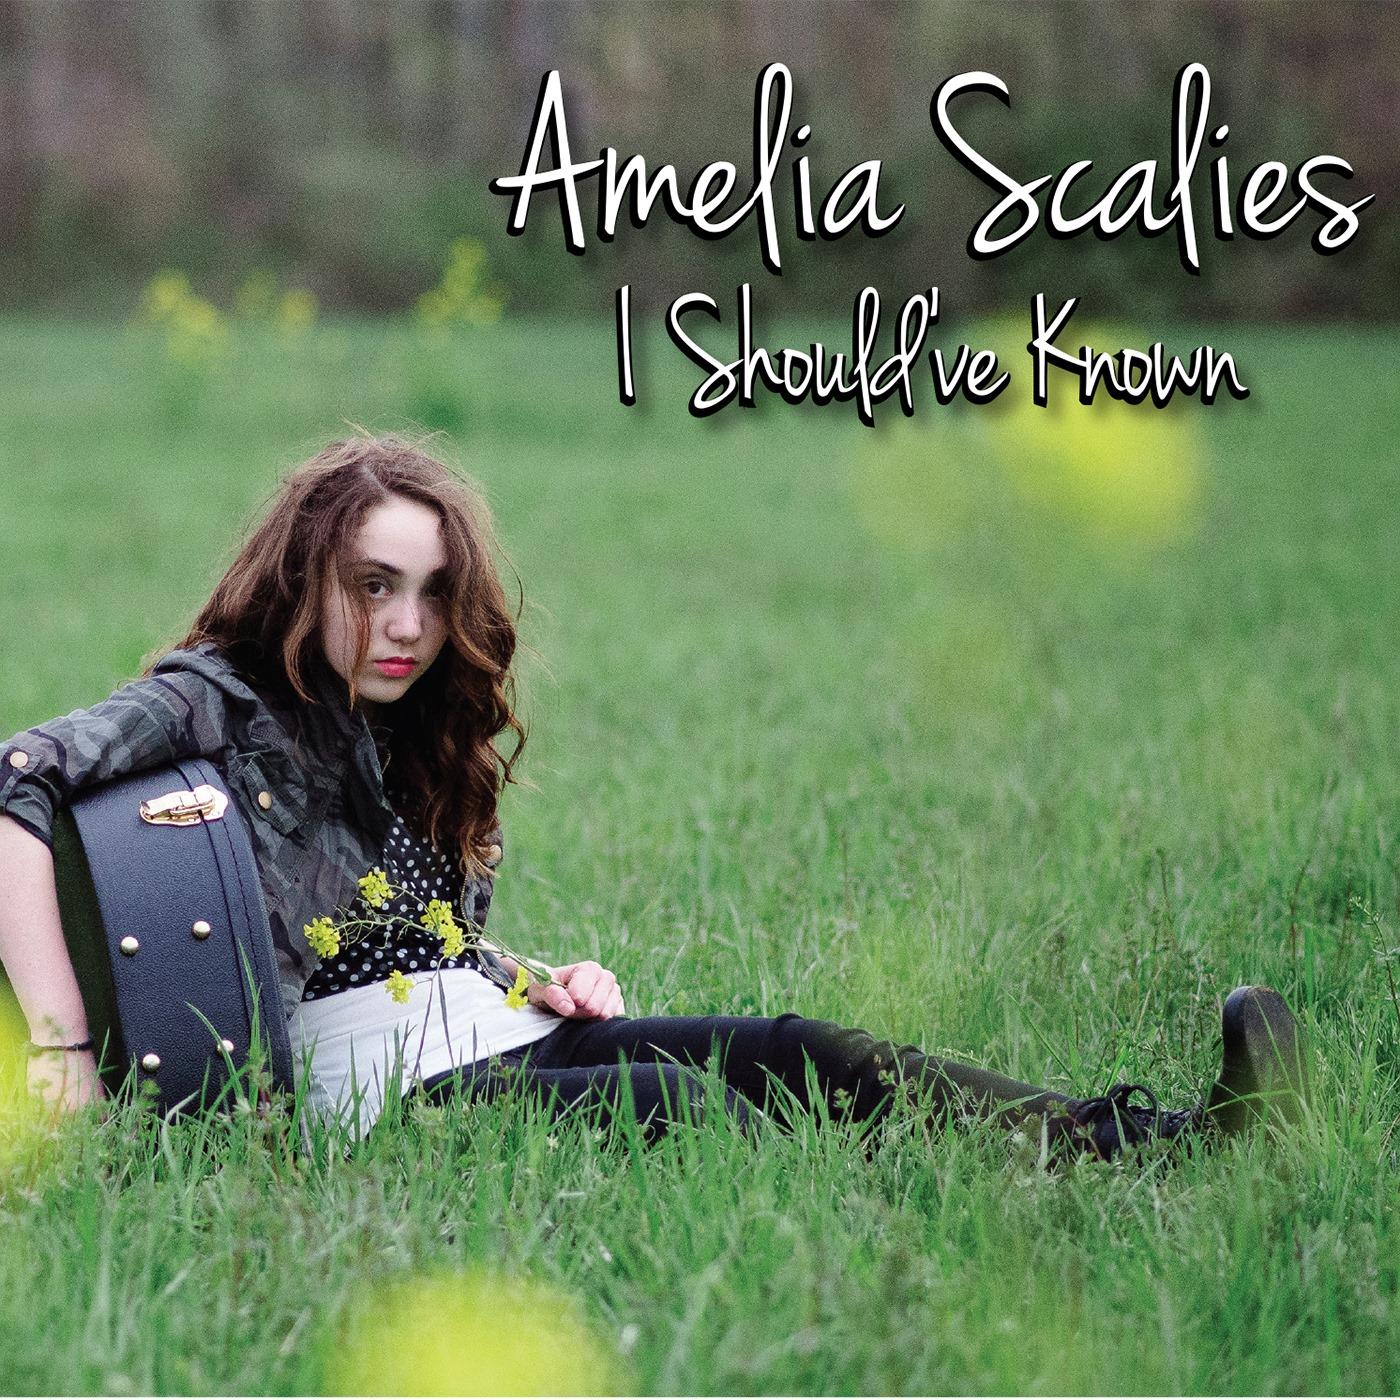 Amelia Scalies